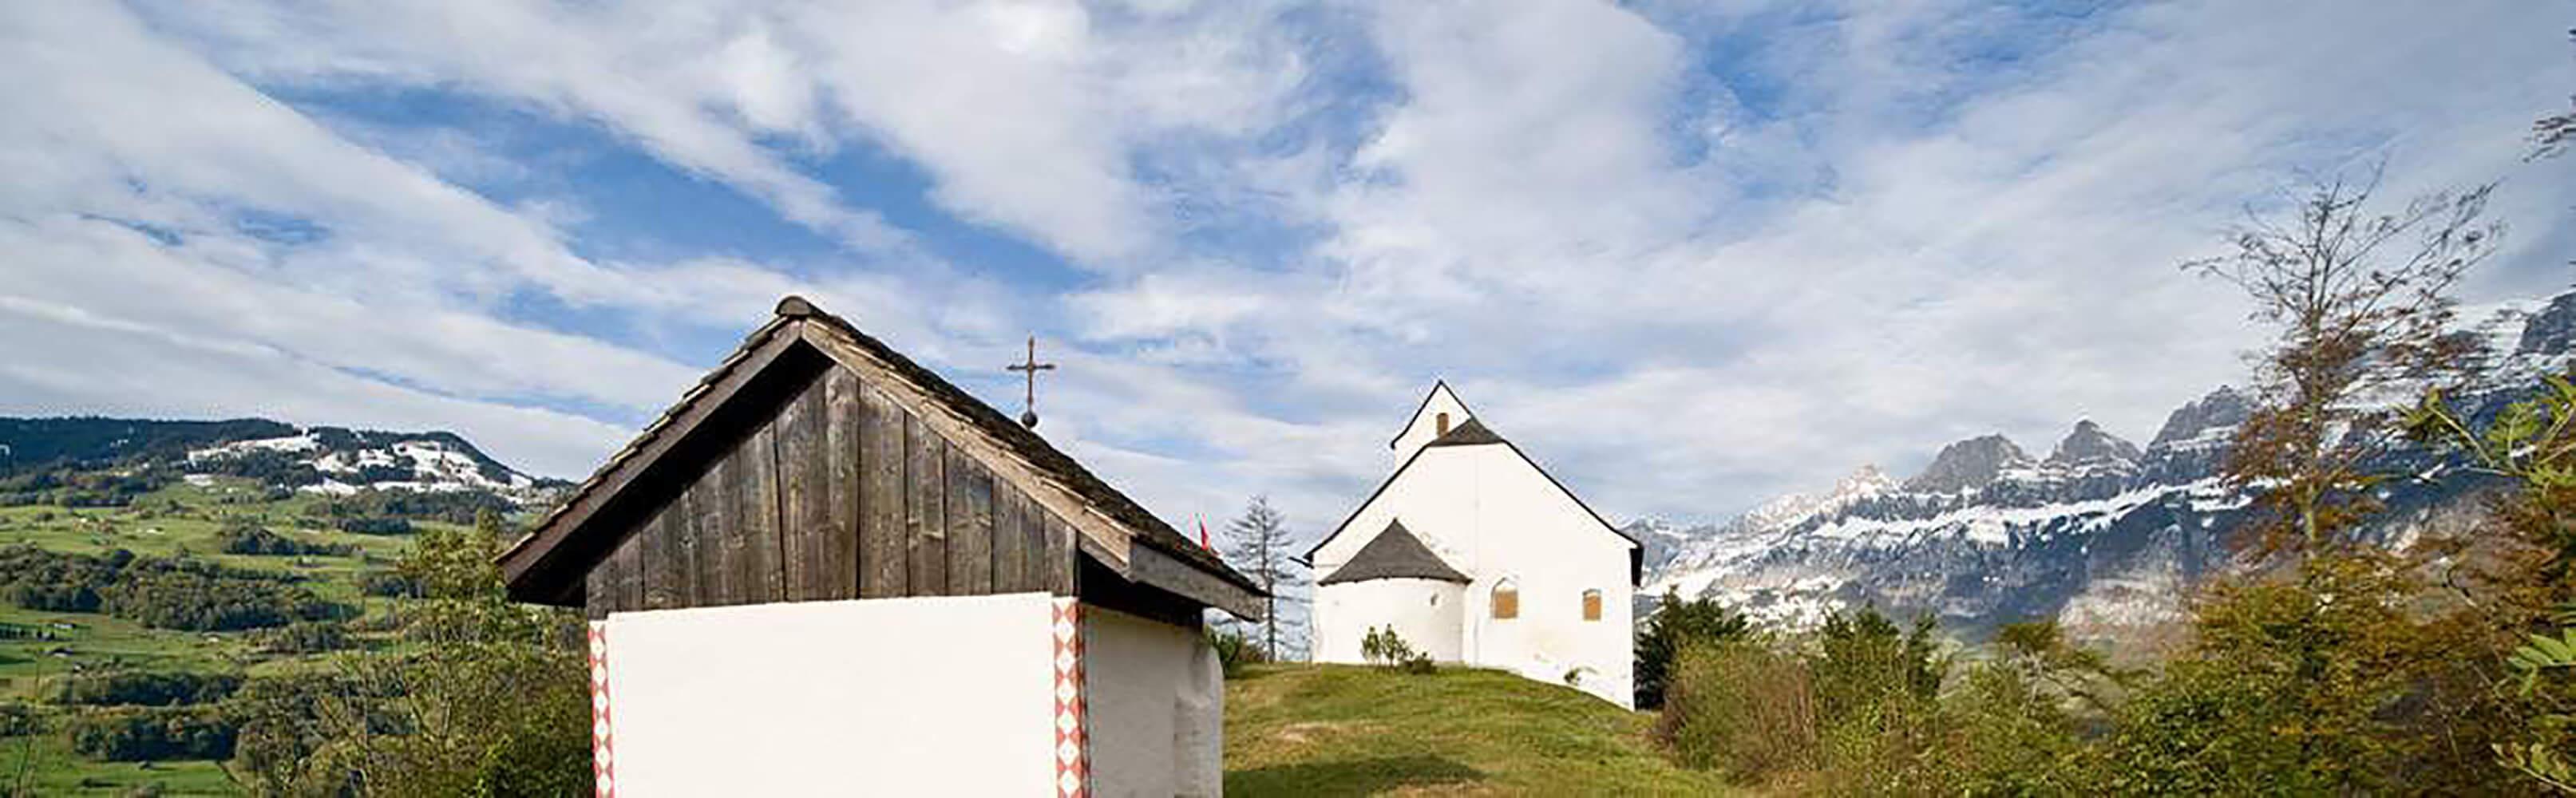 Kulturweg Sankt Georgenberg und Berschnerfall bei Berschis 1